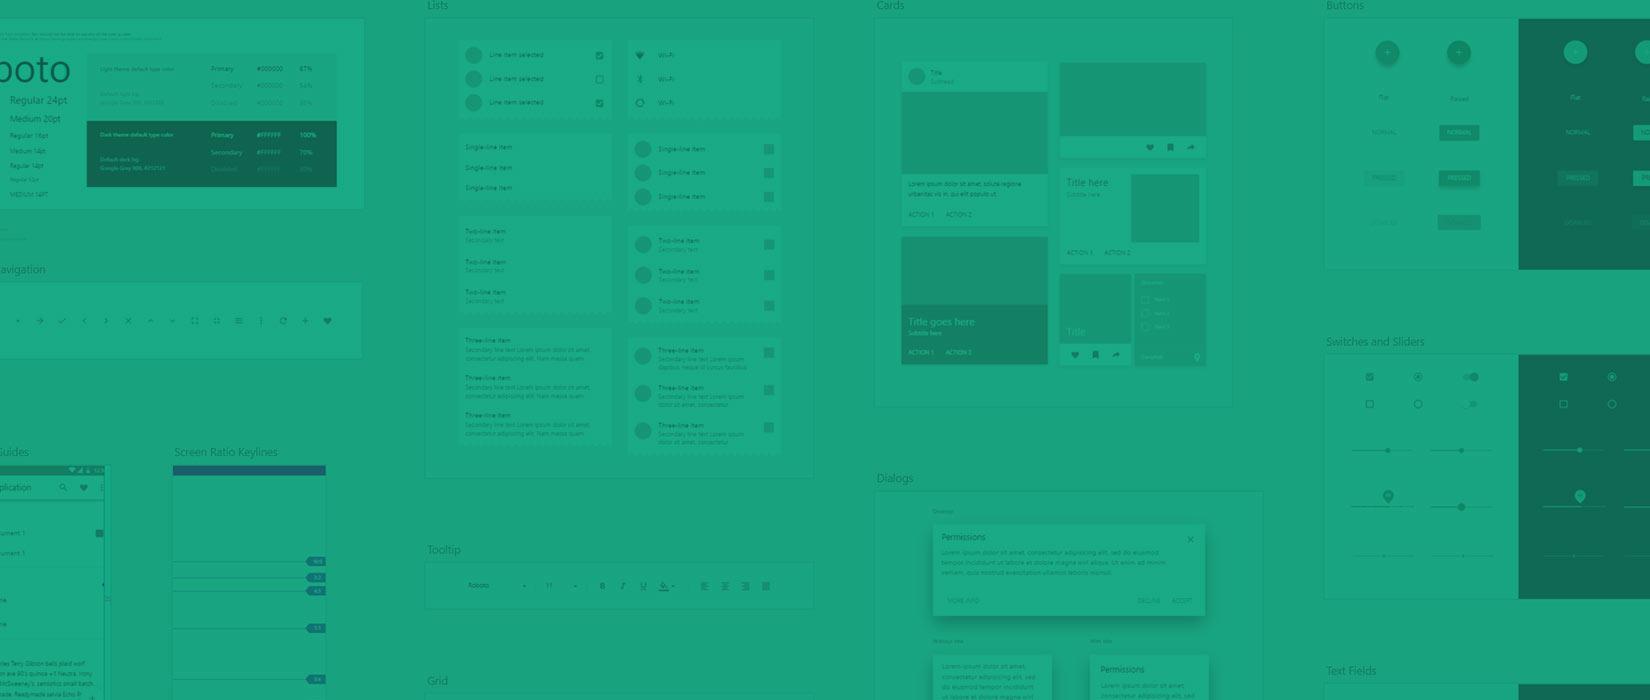 How to Use Adobe XD UI Kits